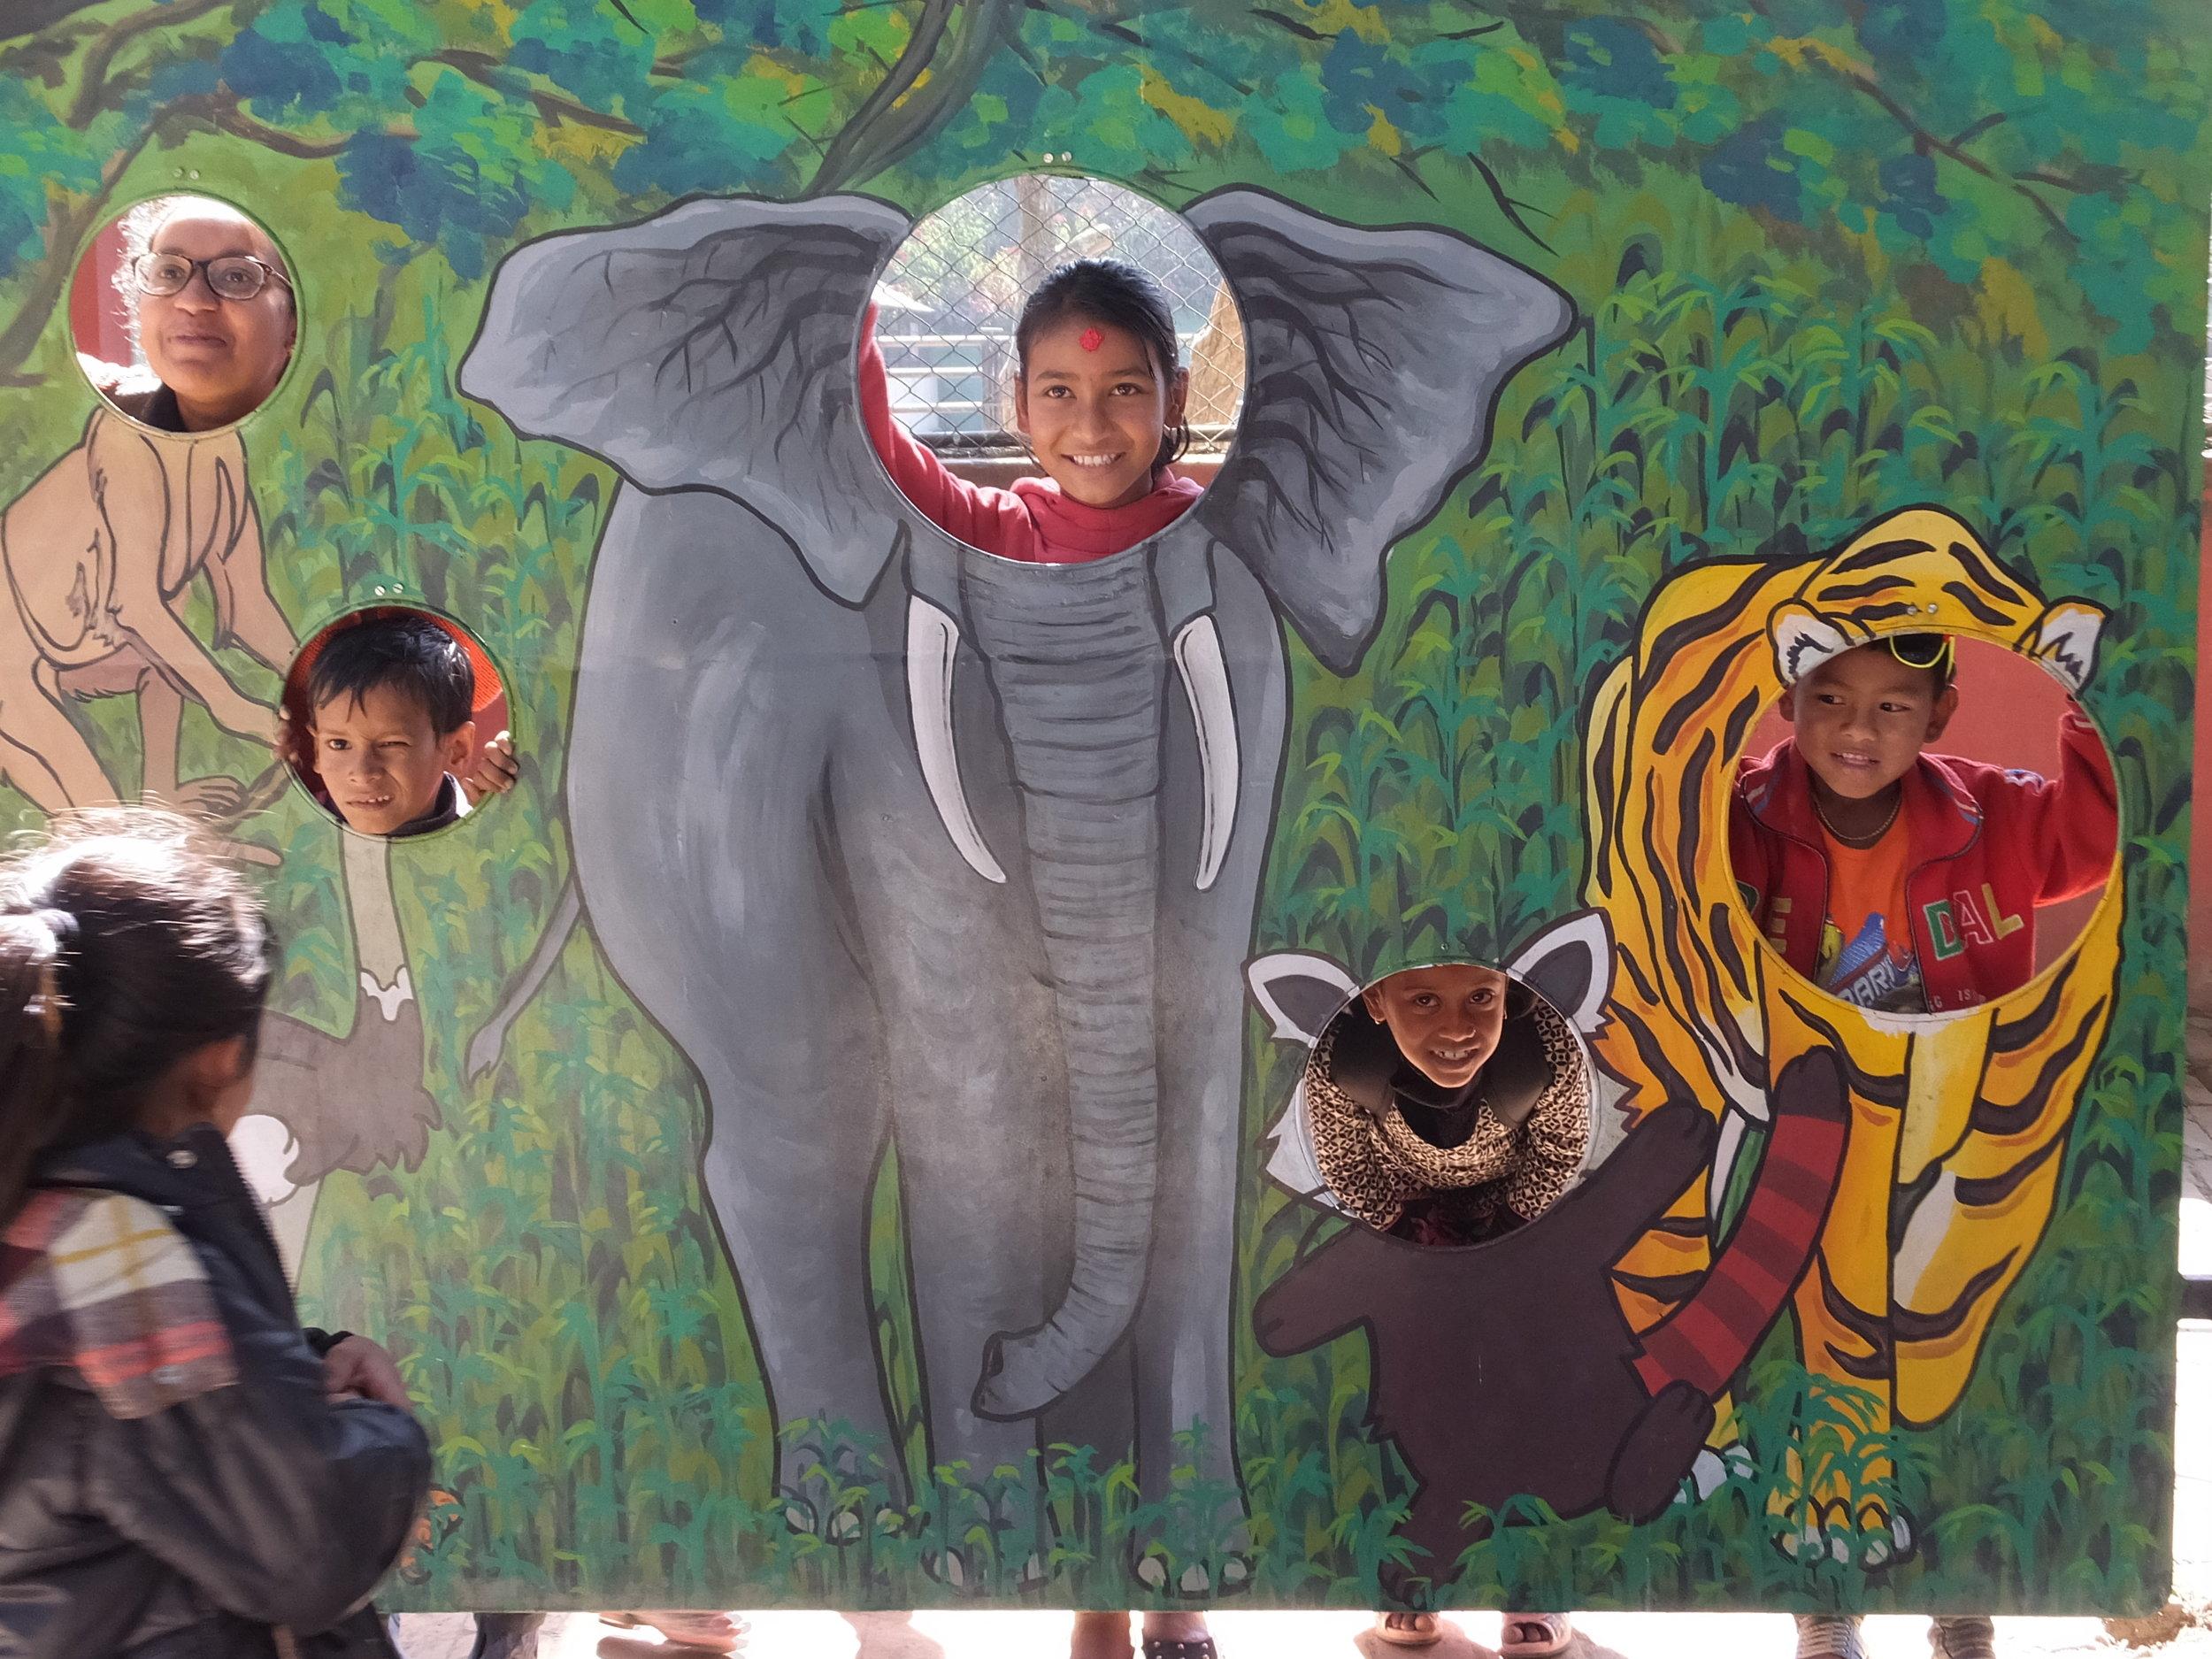 Having fun on a field trip to the Kathmandu Zoo!